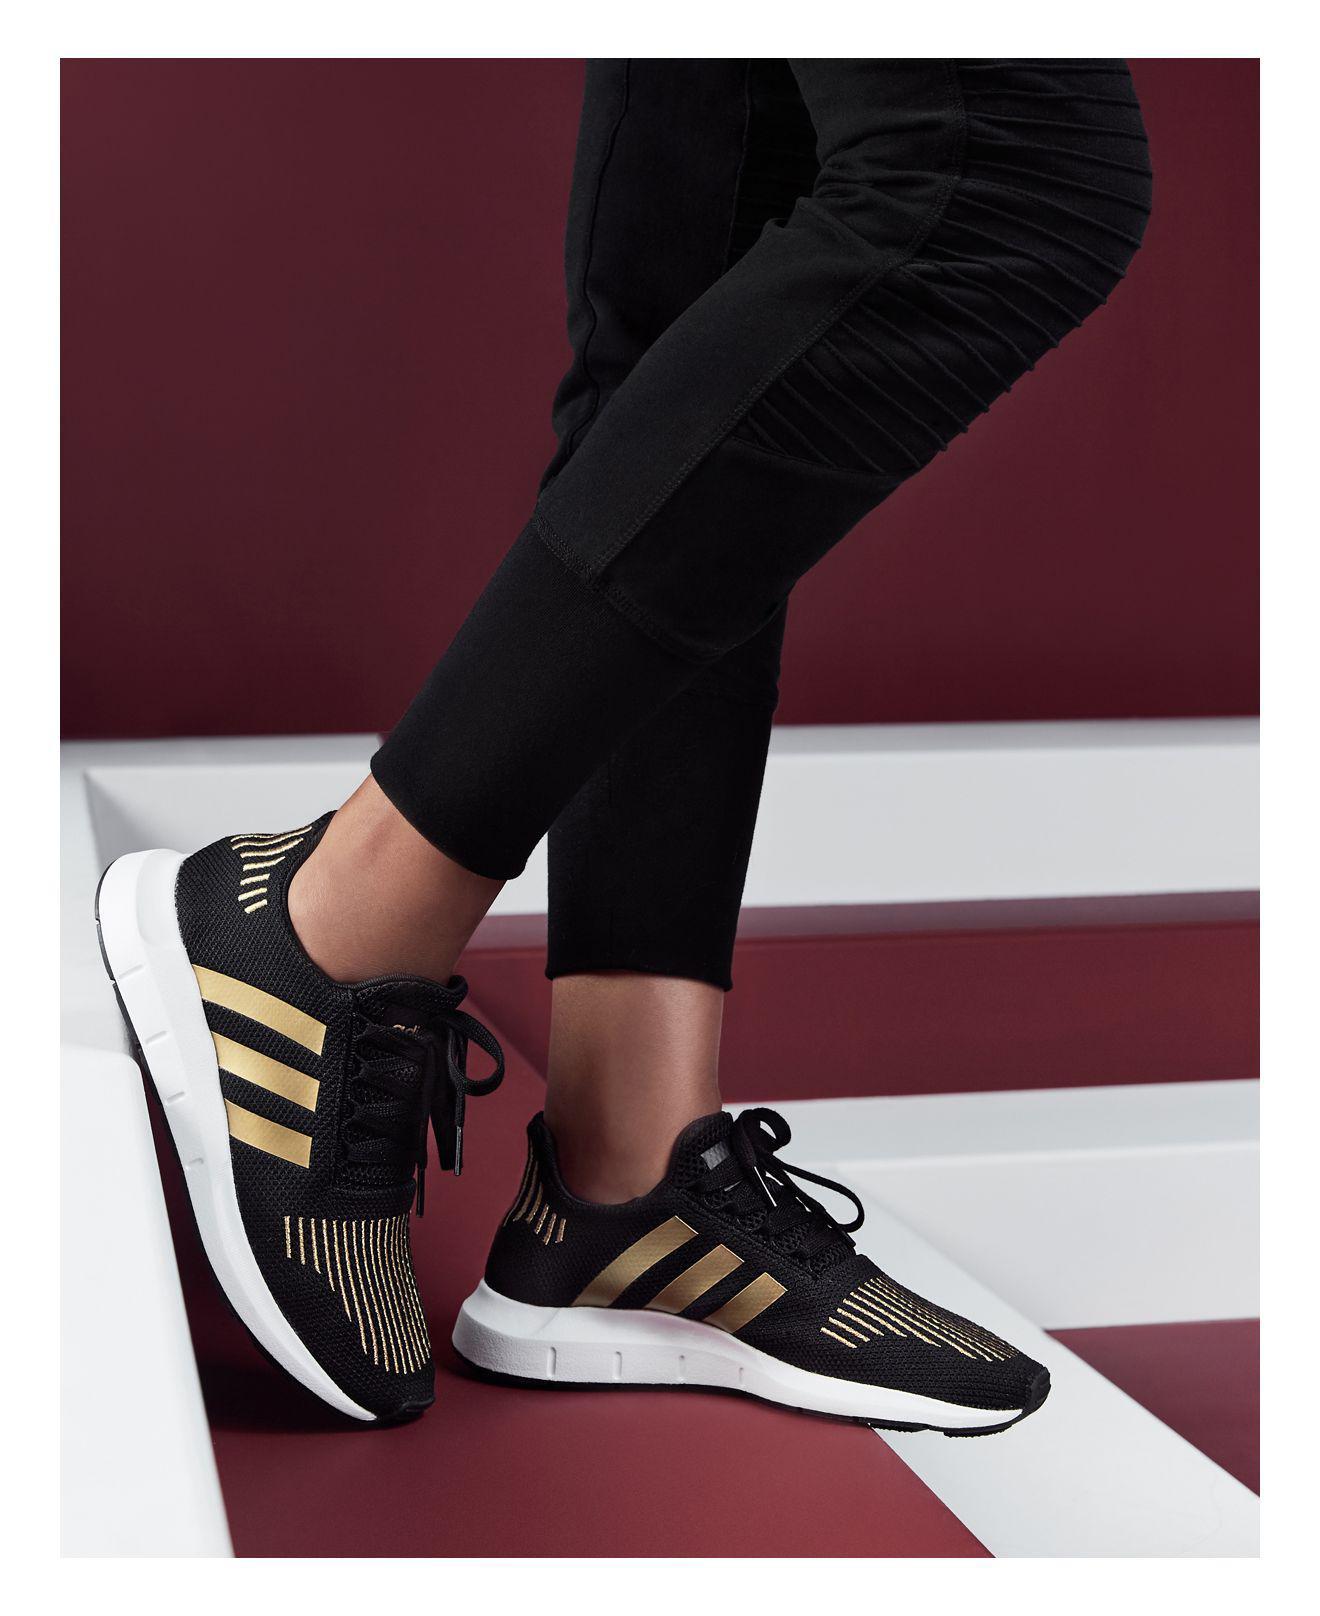 Lyst - adidas Women s Swift Run Sneakers in Metallic 59e564be99